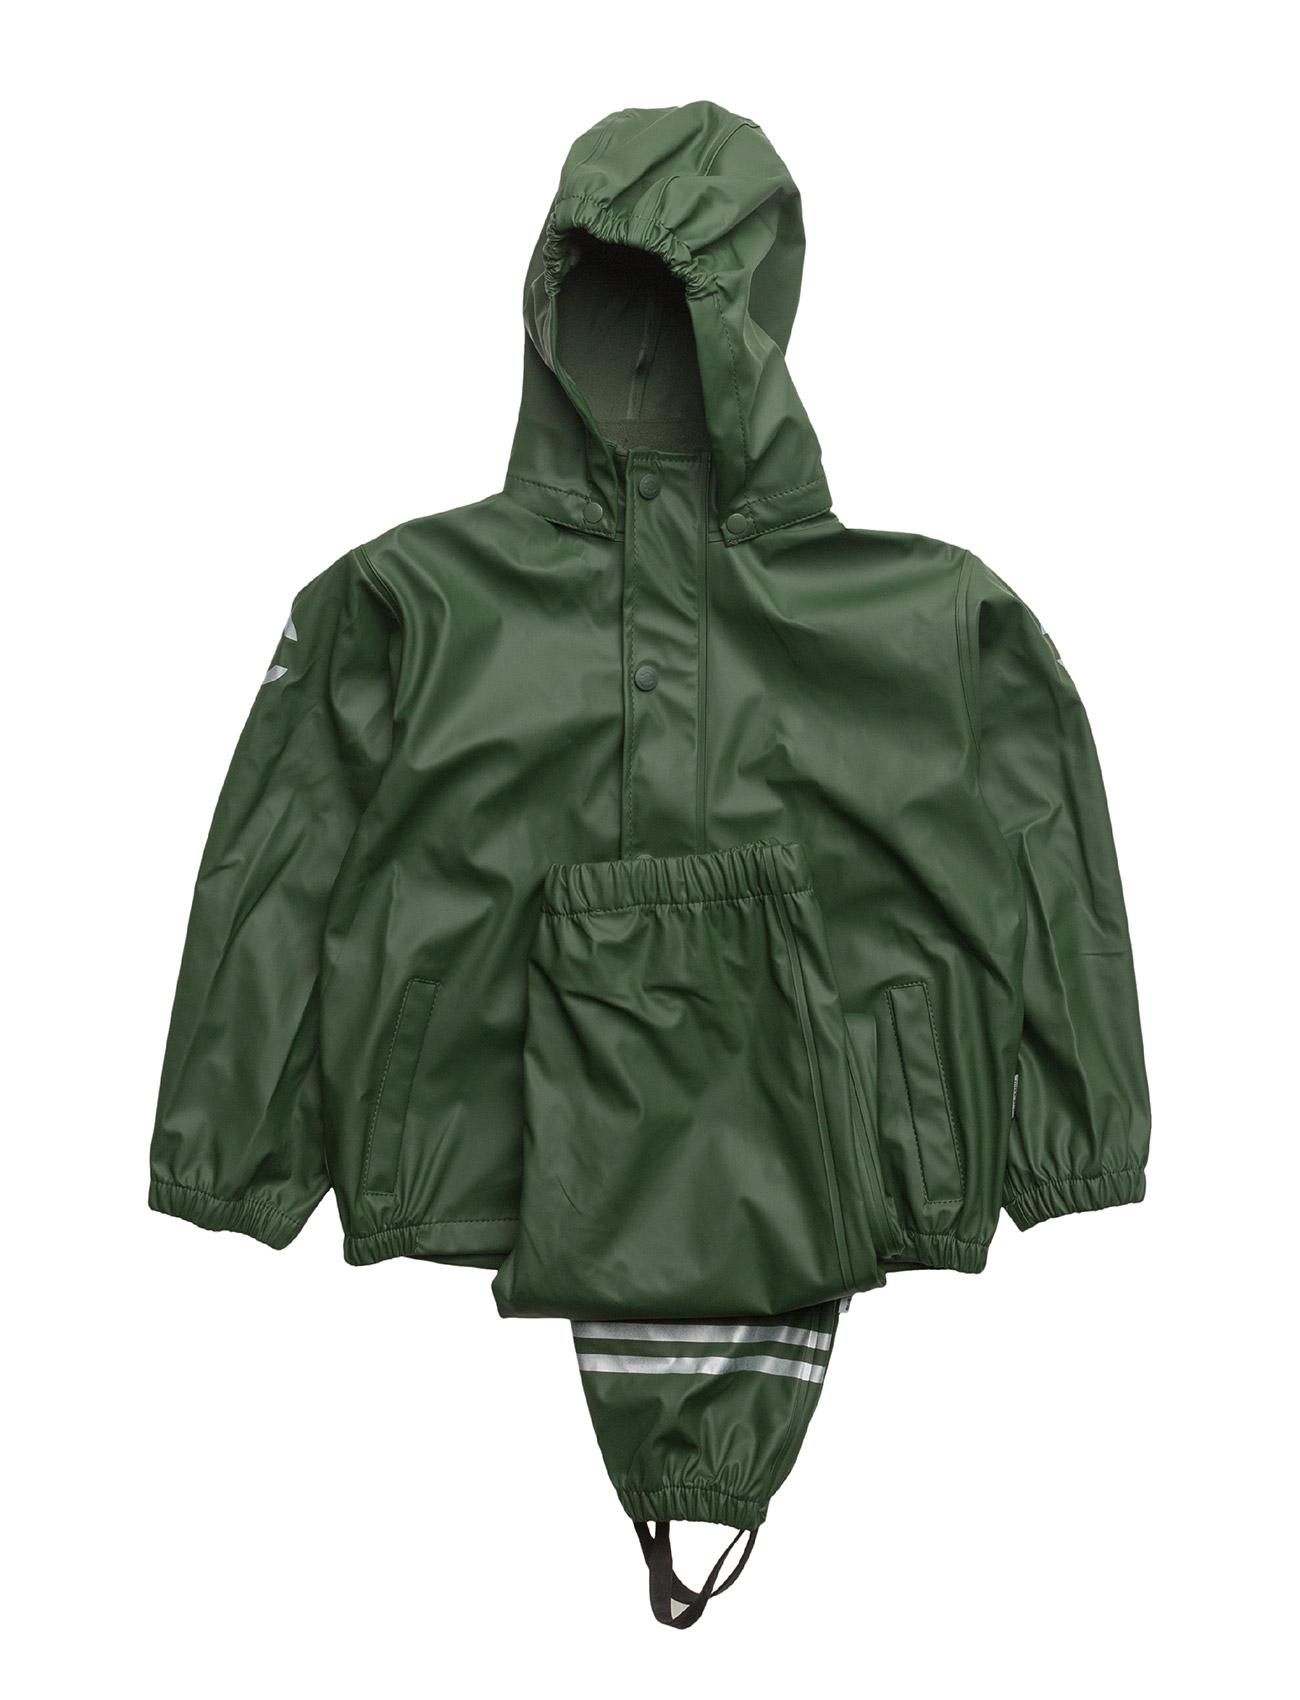 Rain Wear, Pu - Basic Mikk-Line Regntøj til Børn i